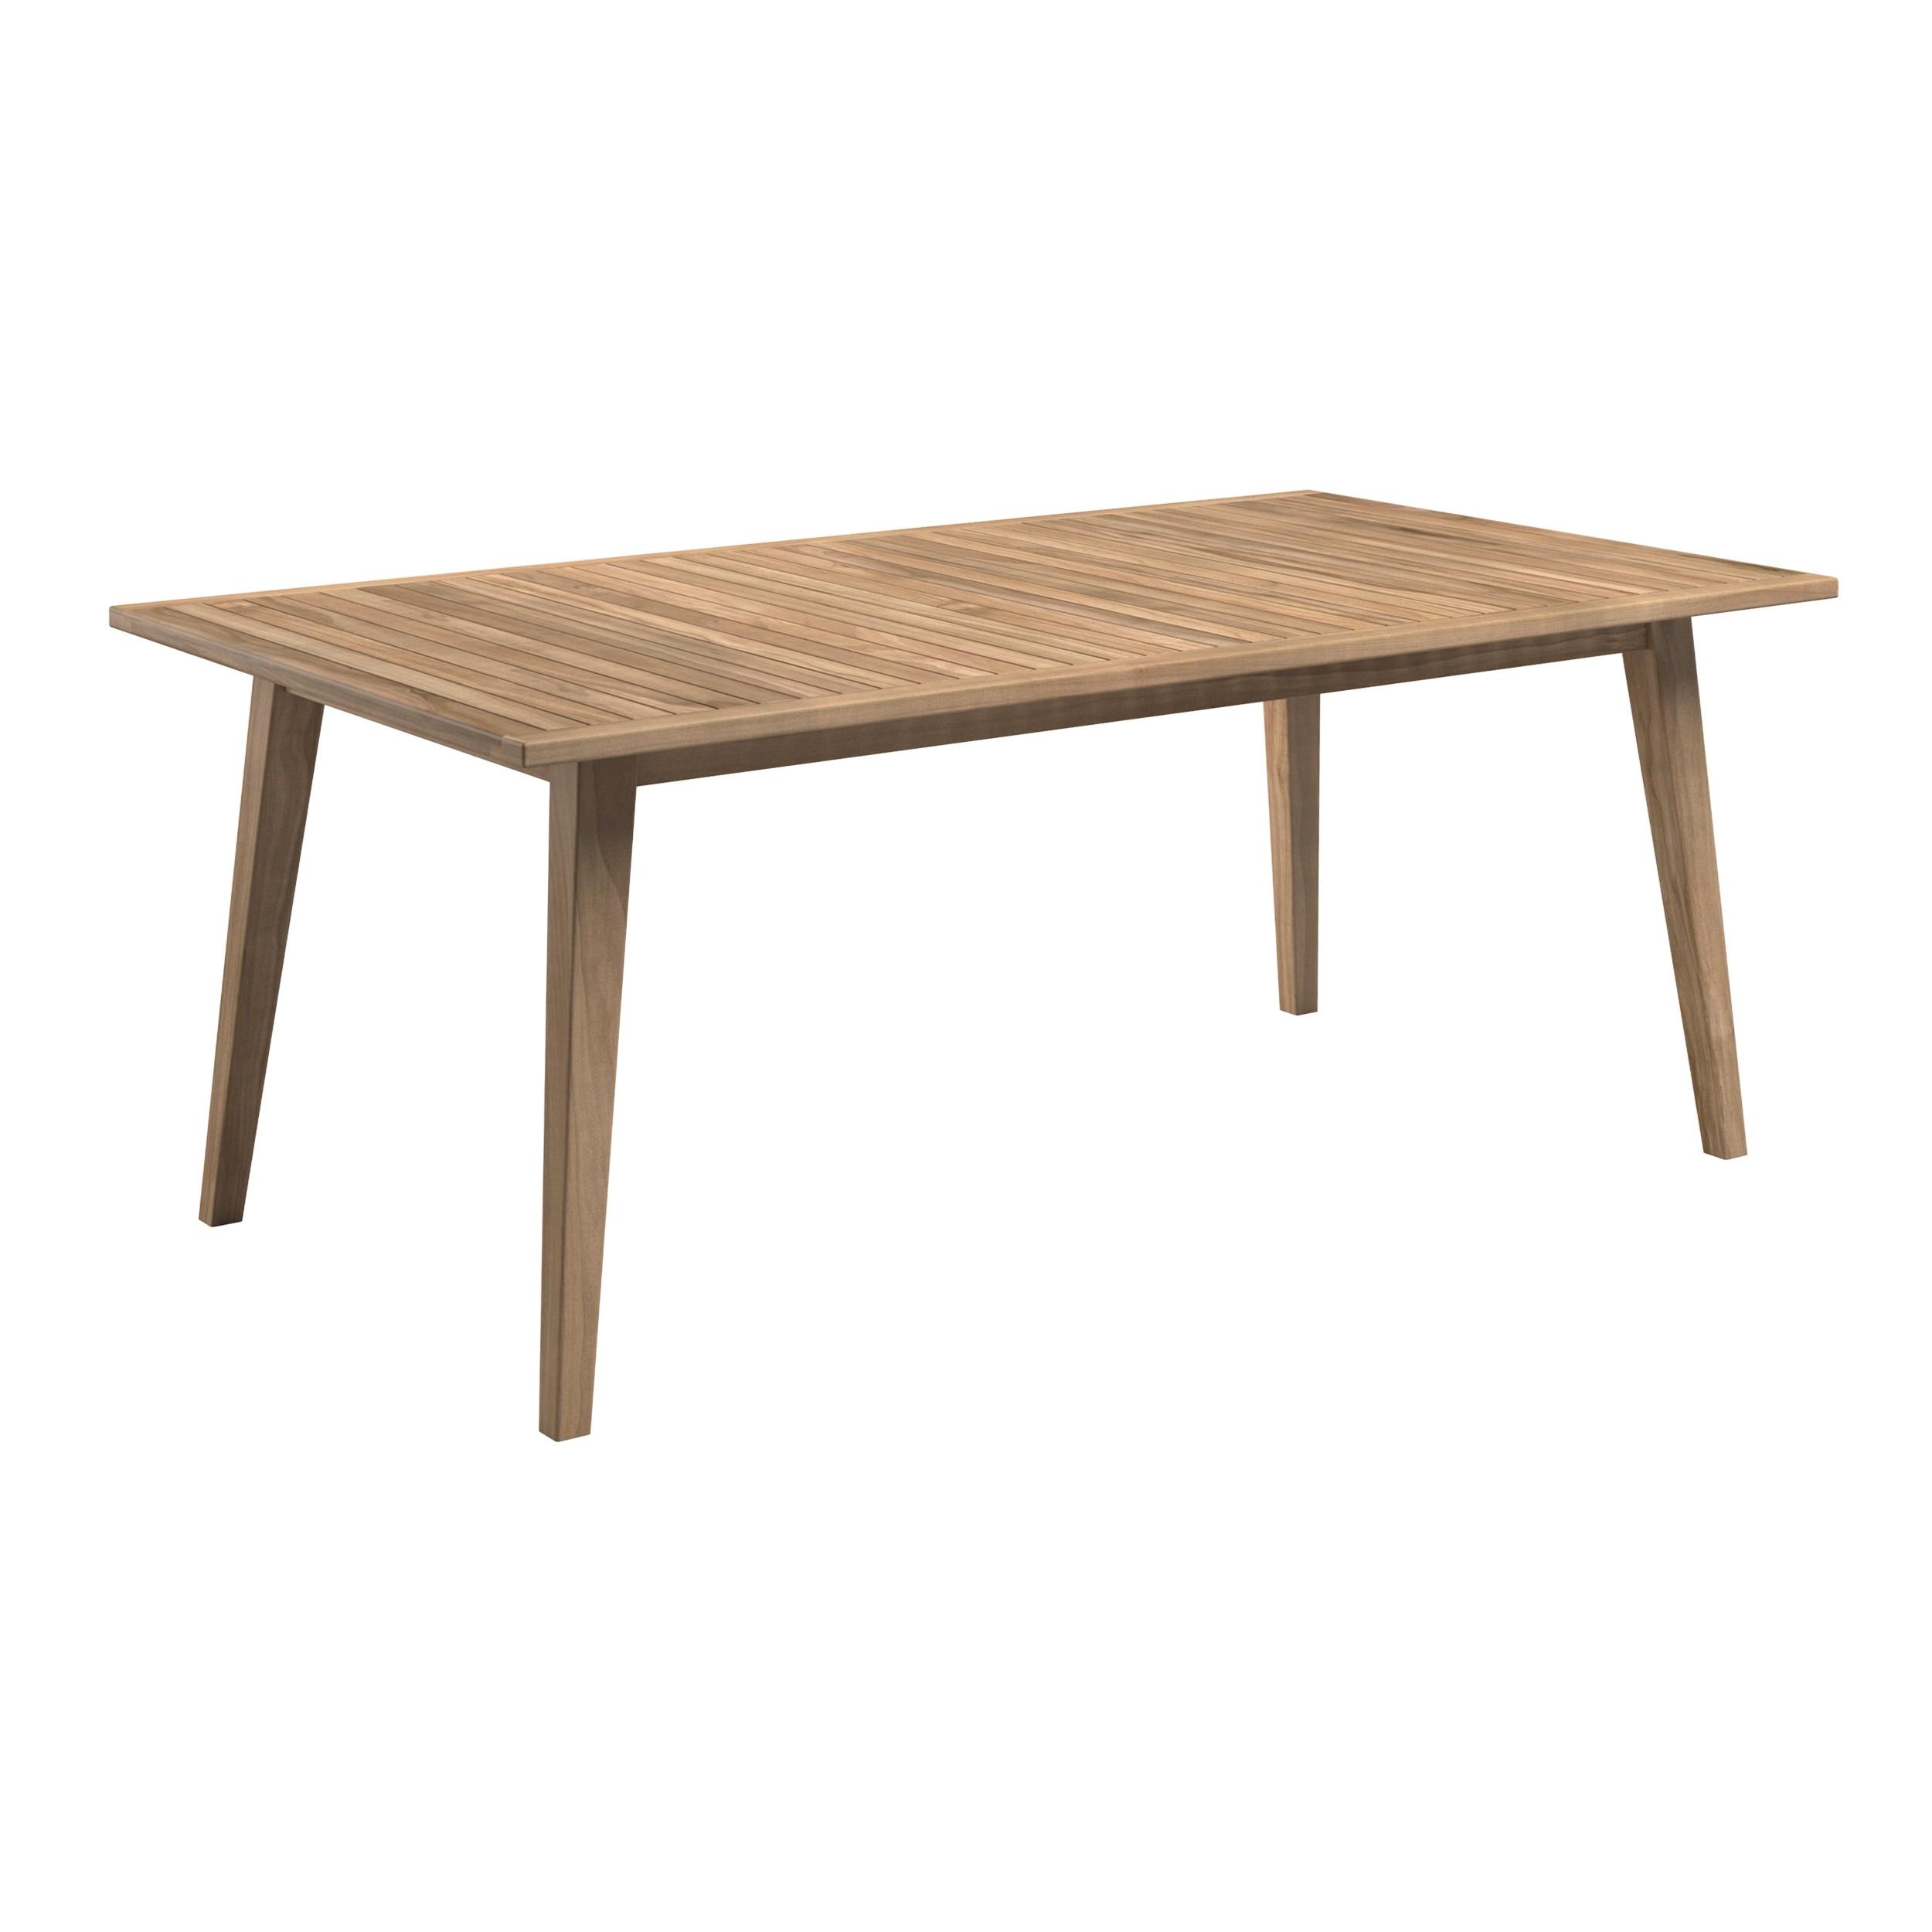 acheter table de jardin 180cm en bois de teck